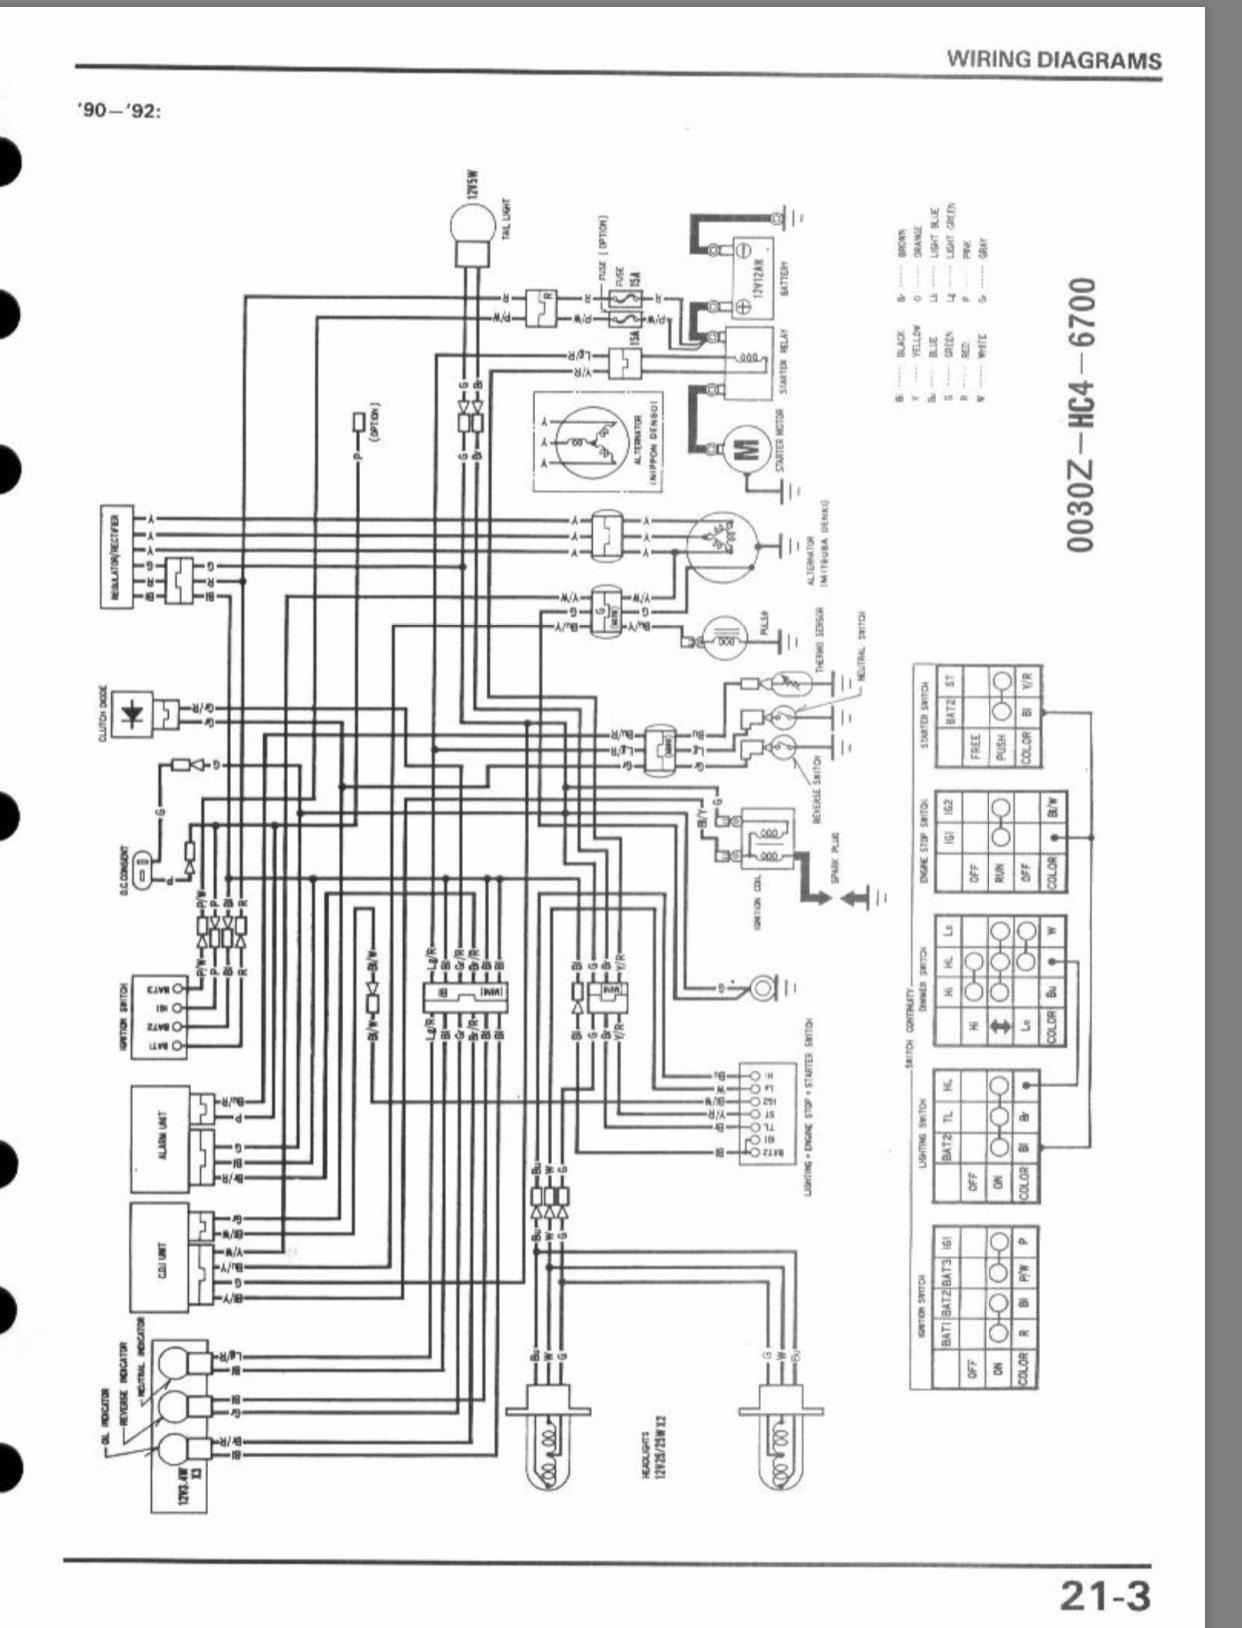 2005 Dodge Magnum Radio Wiring Diagram For Your Needs